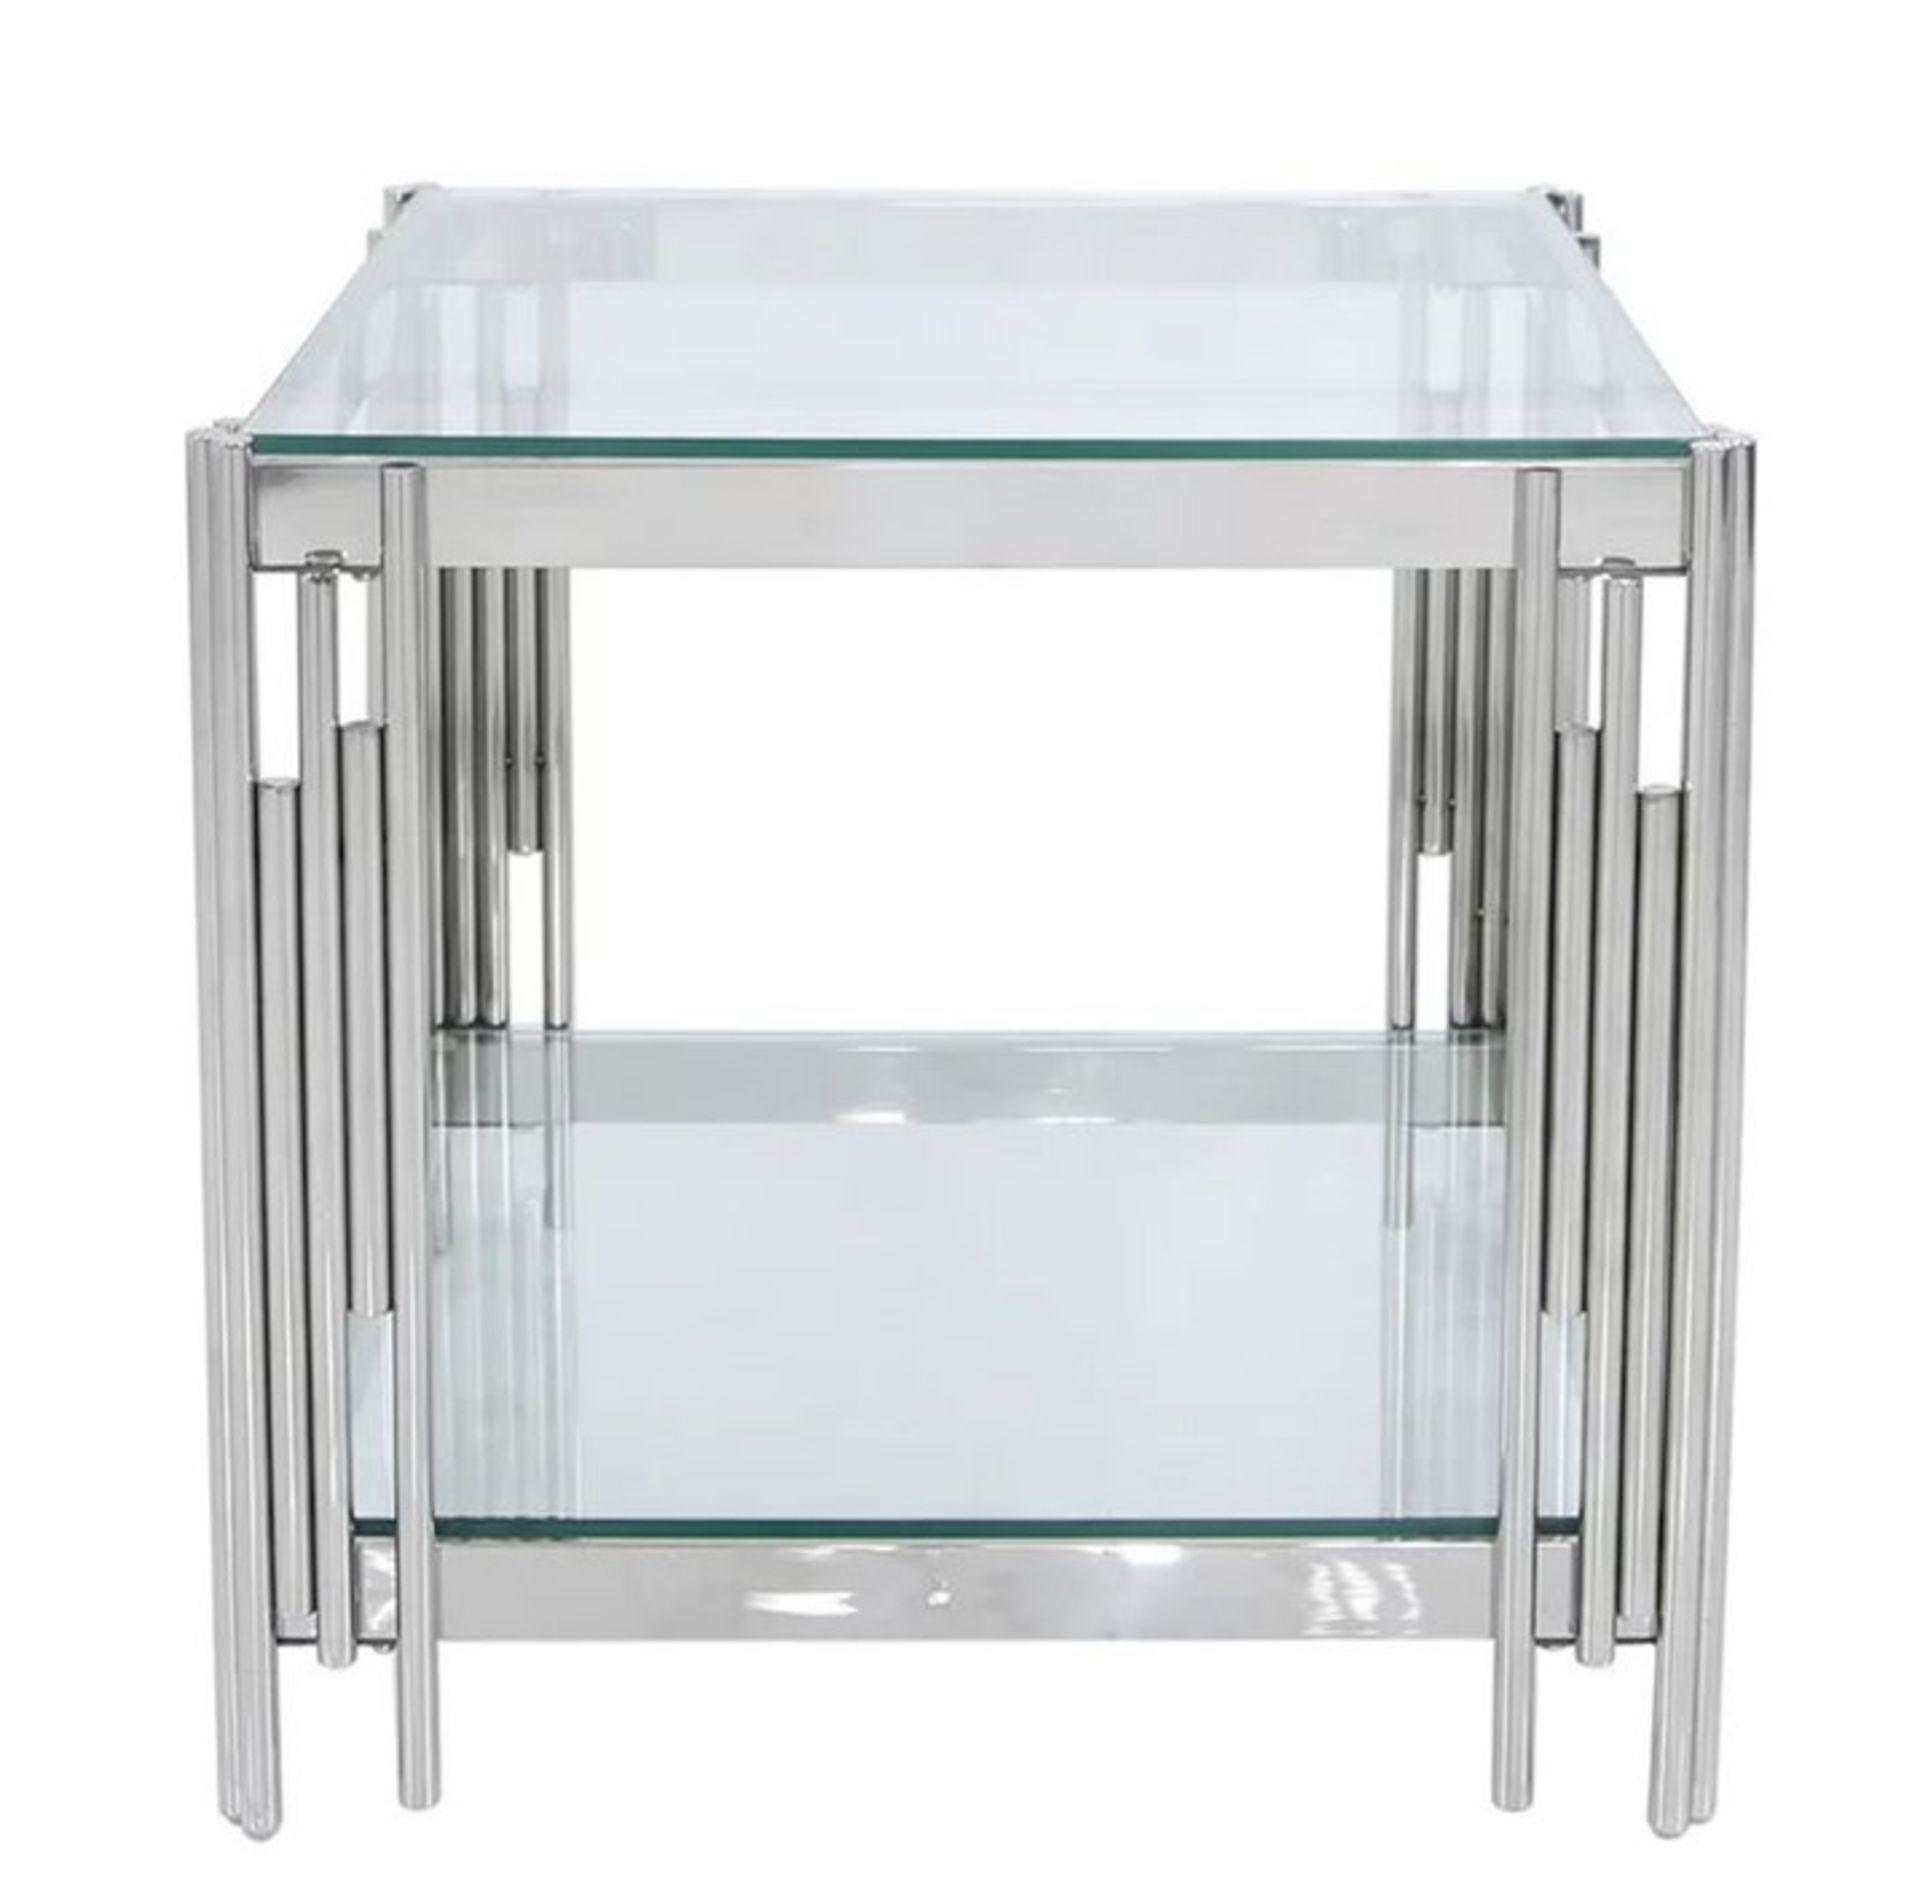 DUCKETT SIDE TABLE